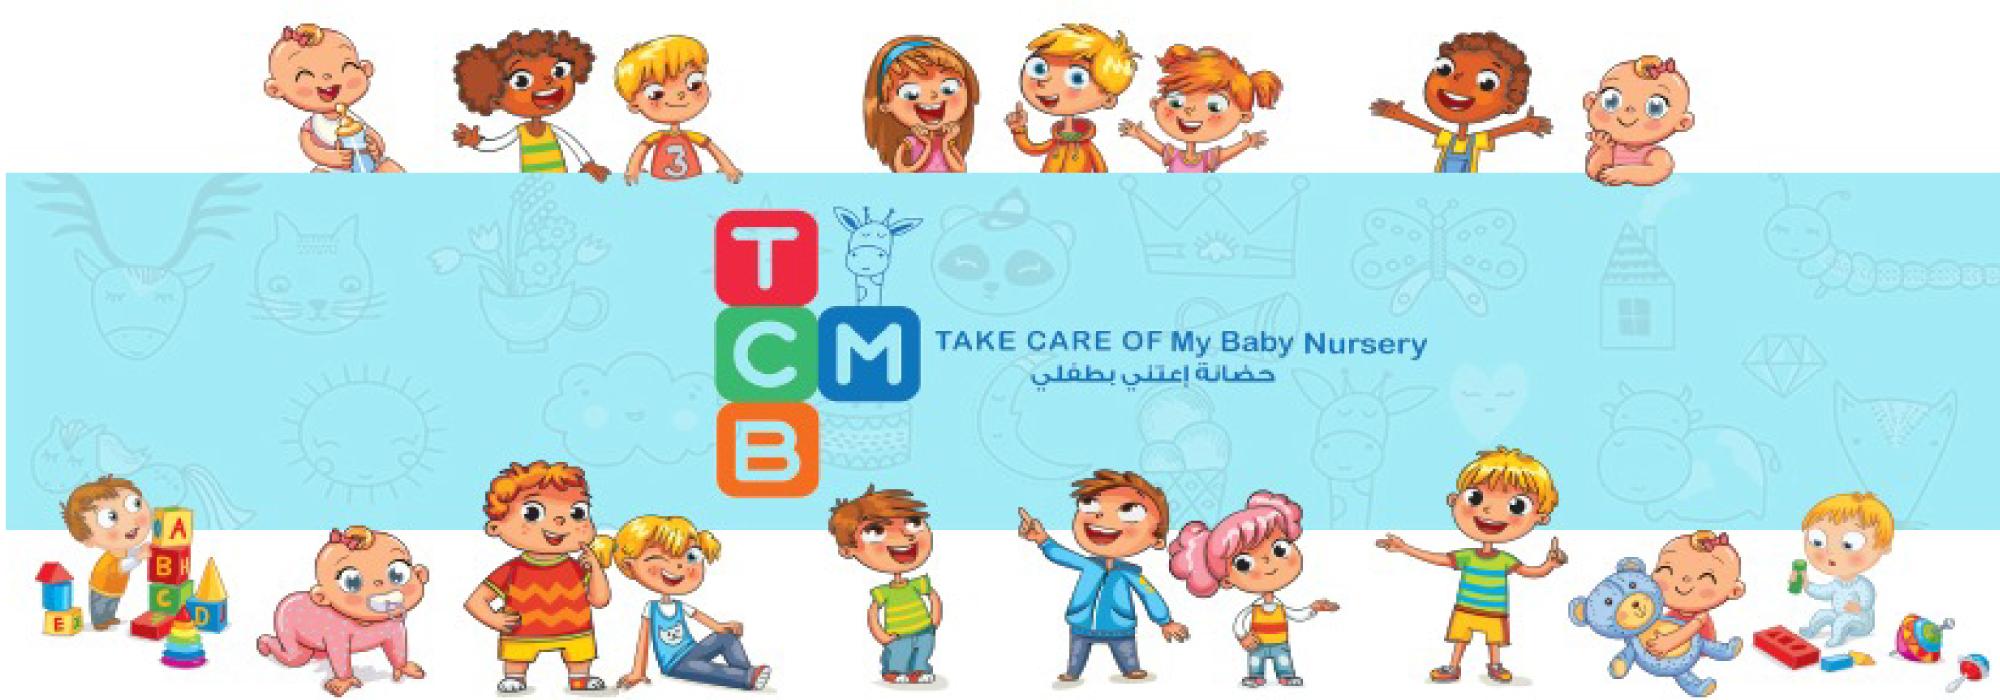 Take Care of My Baby Nursery in Qatar